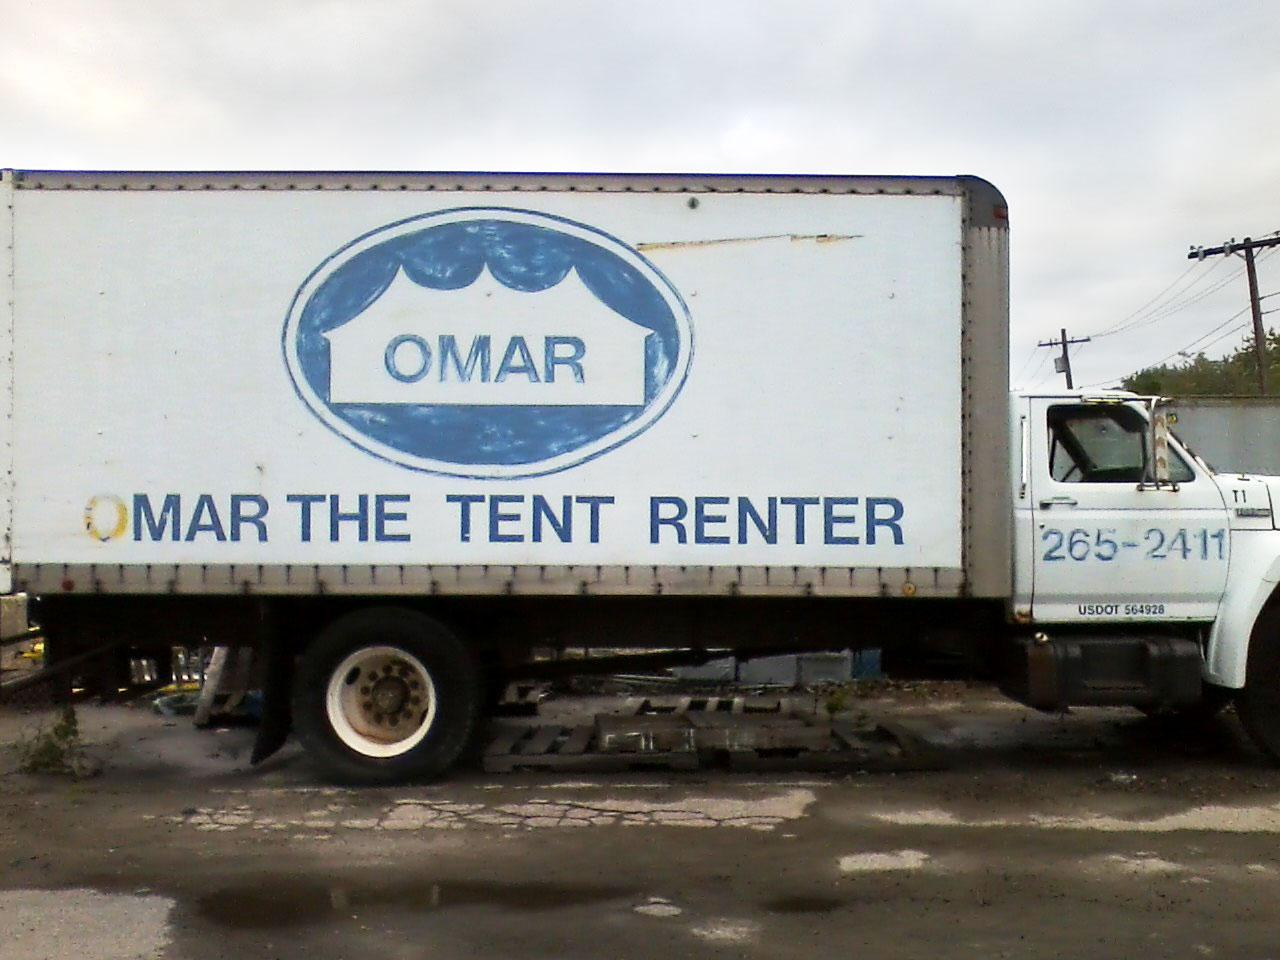 Omar the Tent Renter